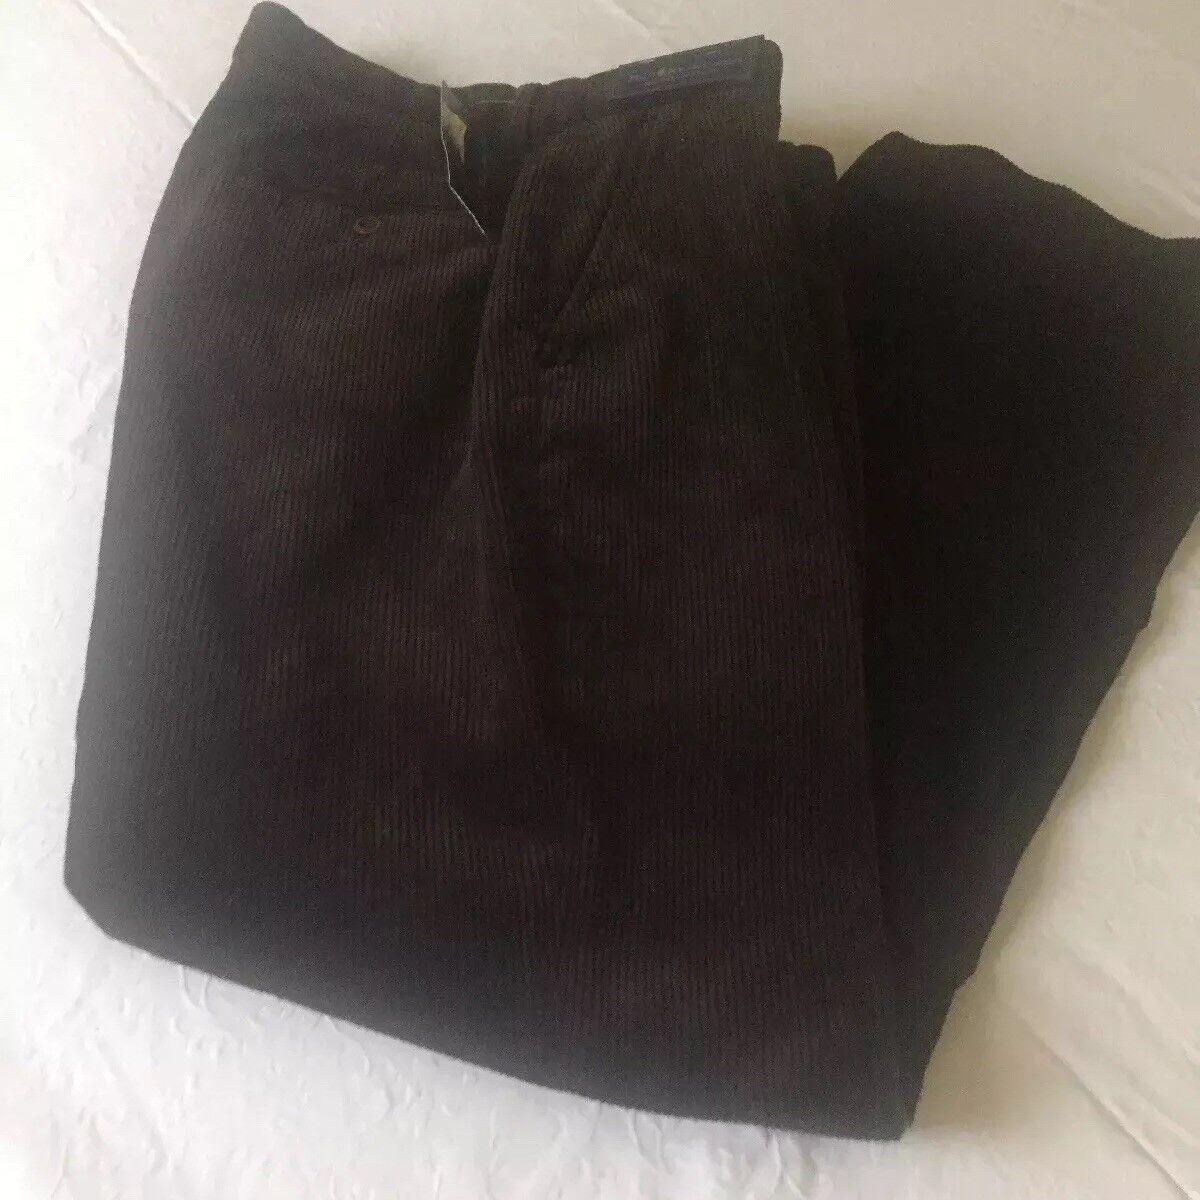 Polo Ralph Lauren Pant Corduroy  Pants Preston Pant   Straight Fit 36W  32L